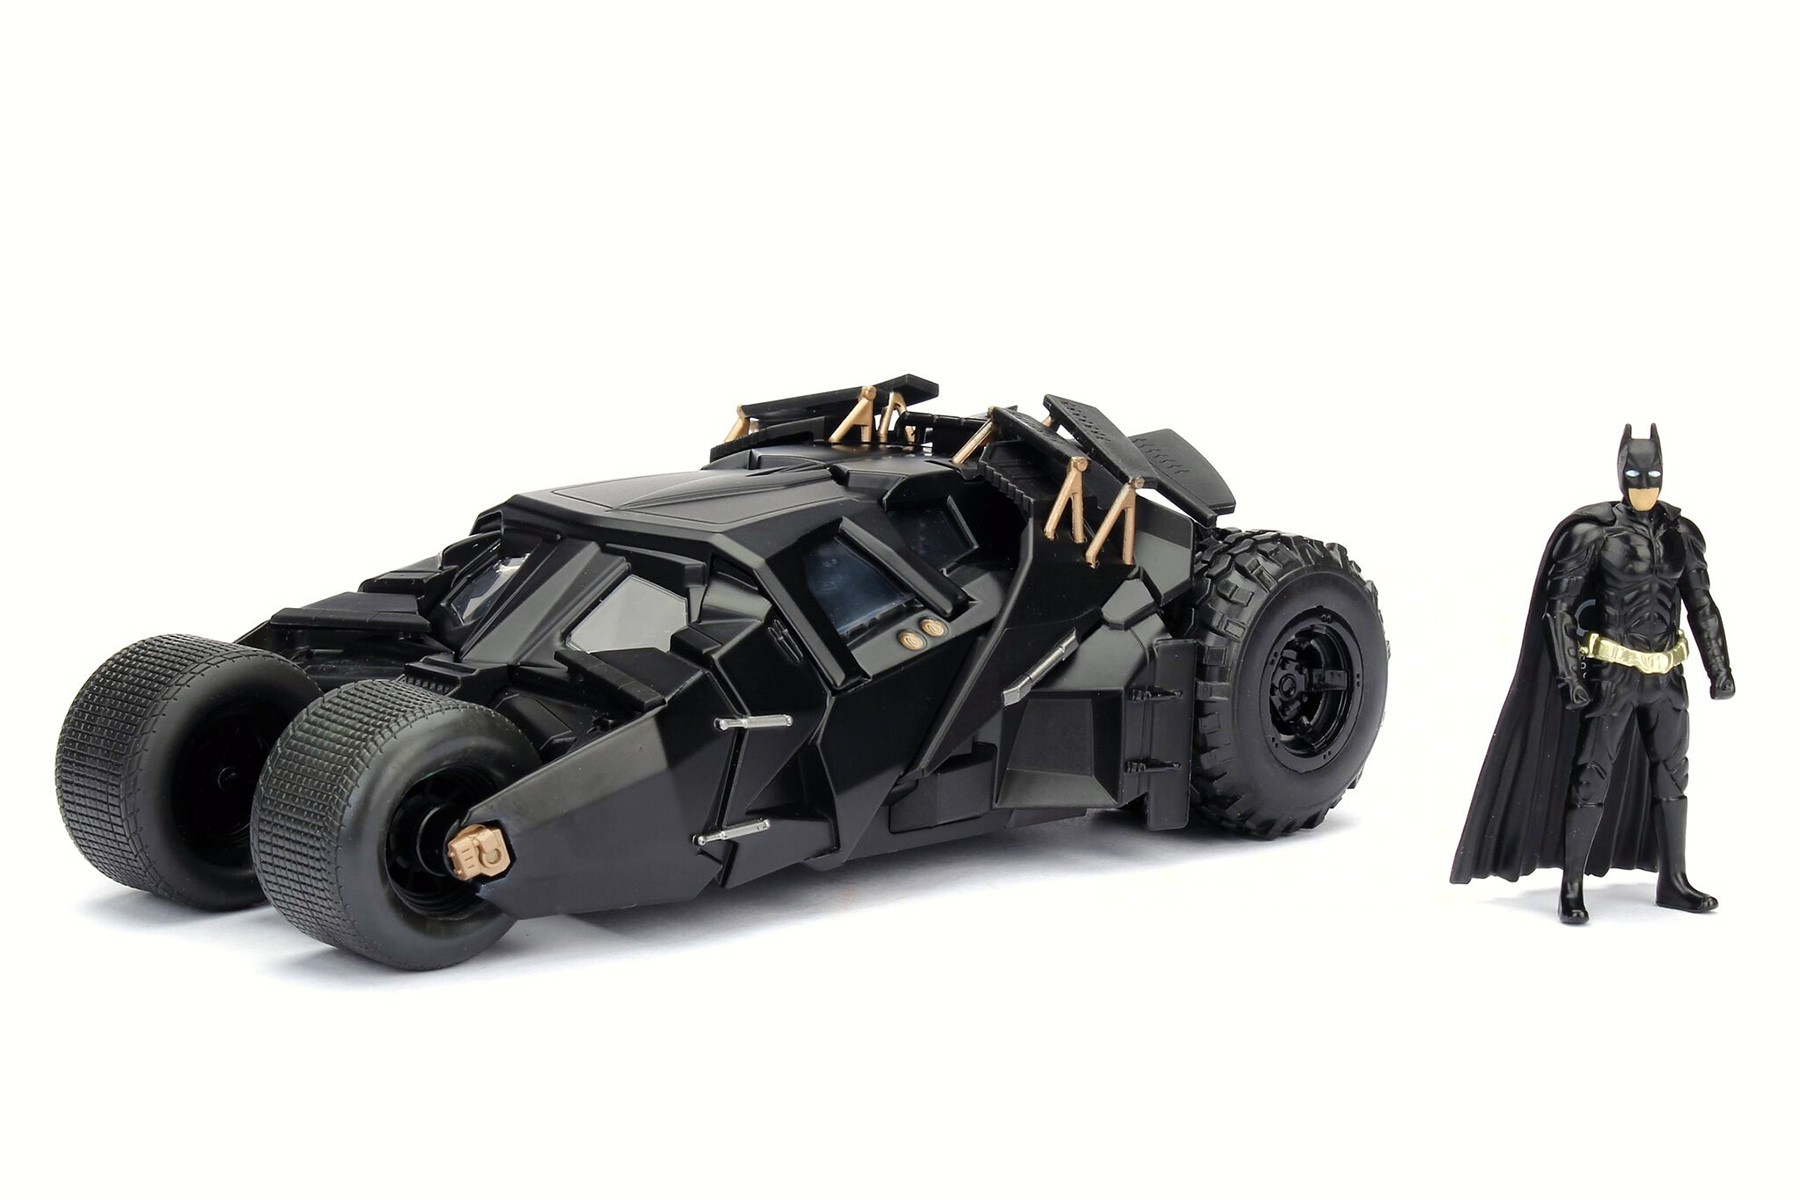 98261-jada-black-the-dark-knight-batmobile-124-1.jpg